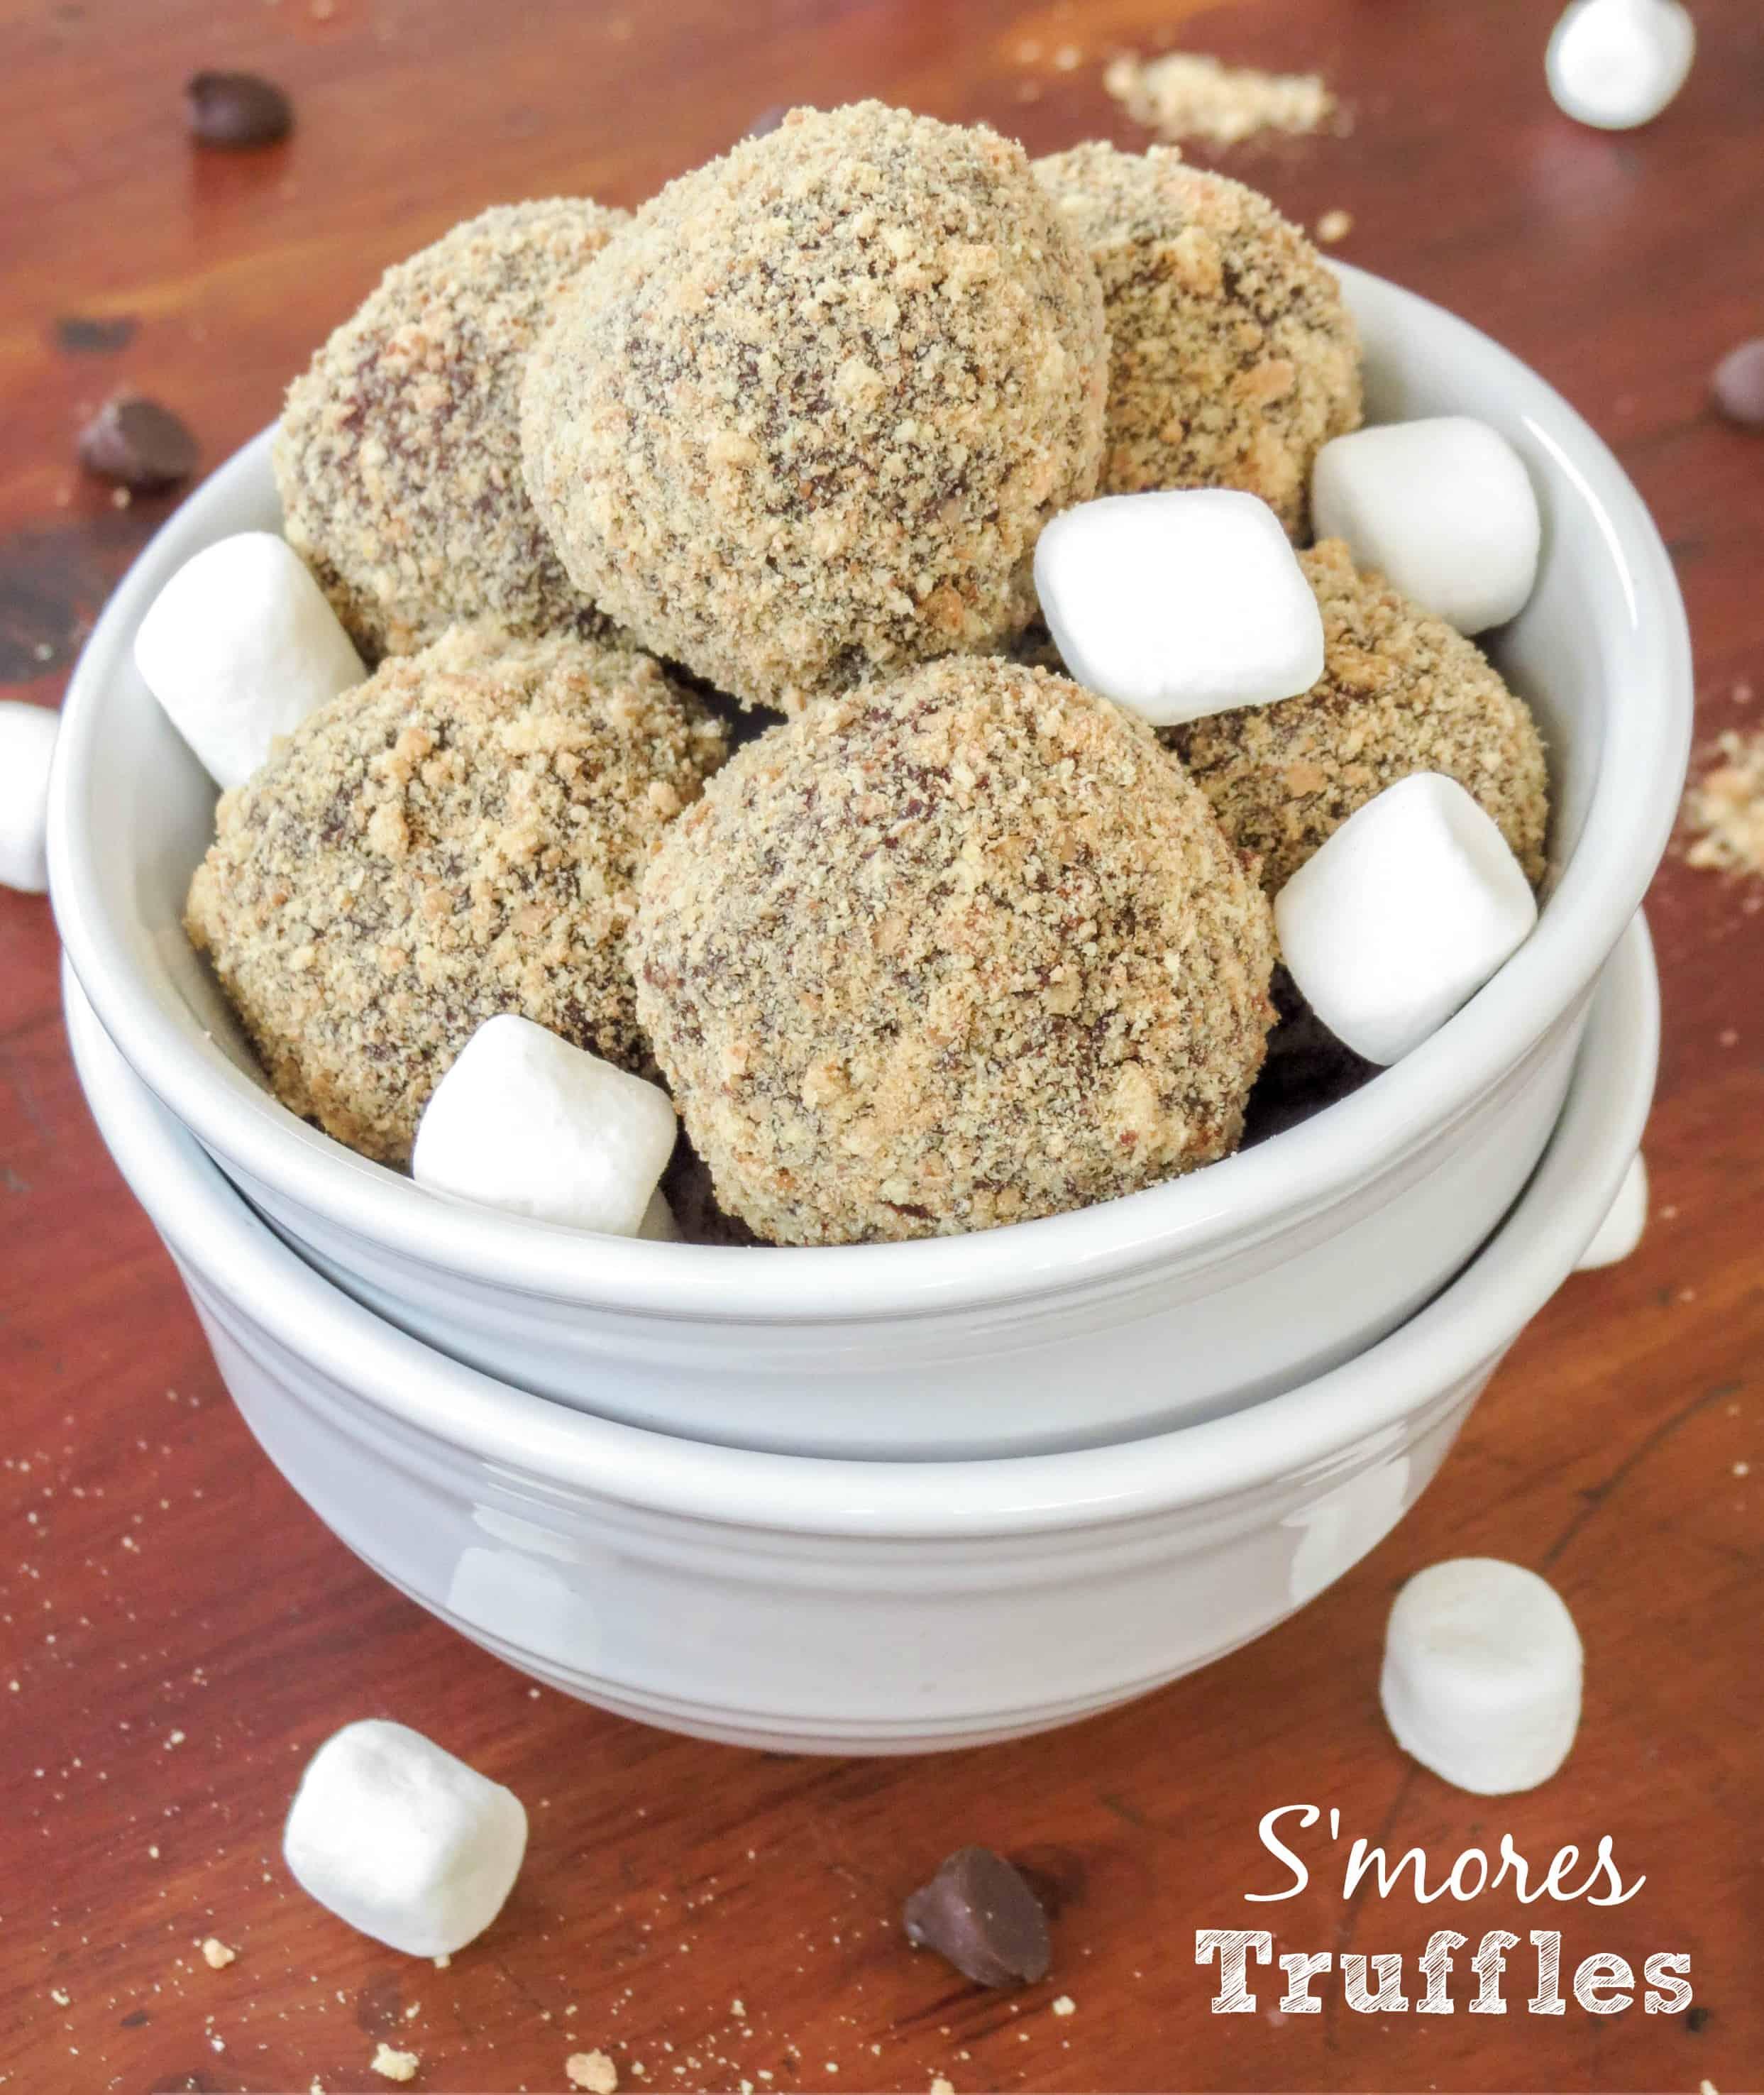 mores Truffles - Sprinkle Some Sugar